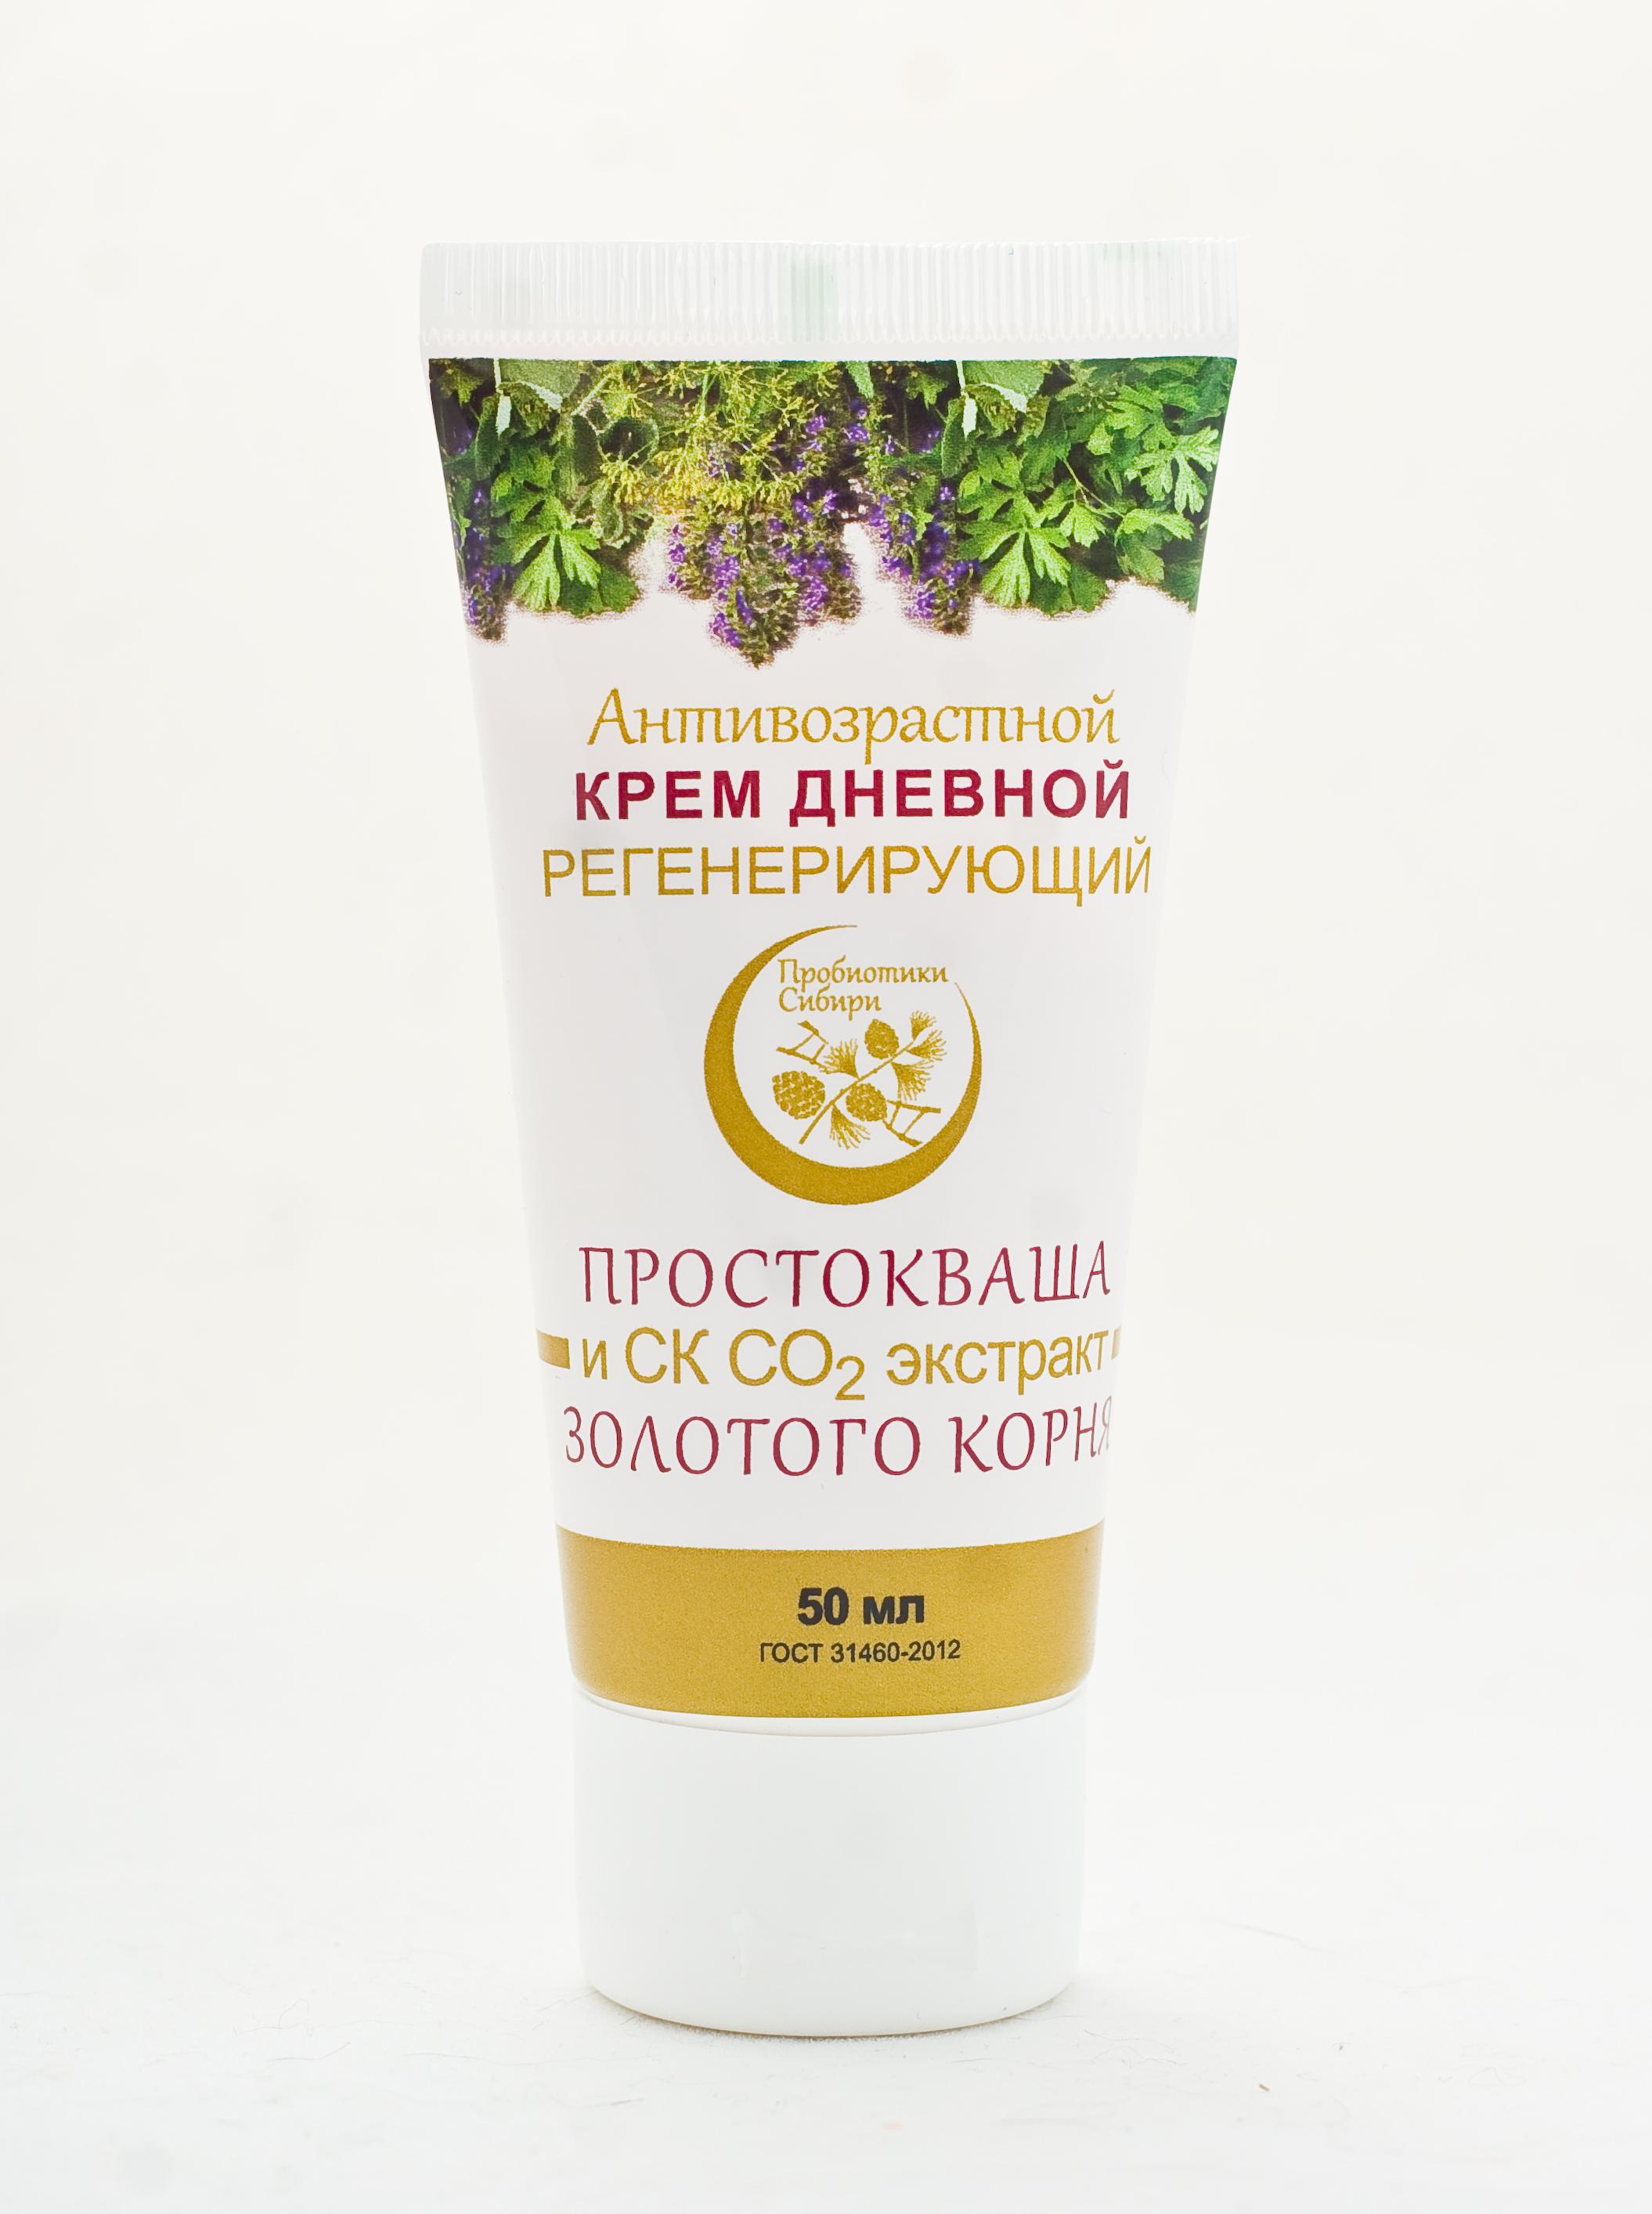 Крем для ухода за кожей Пробиотики Сибири 980004 Пробиотики Сибири